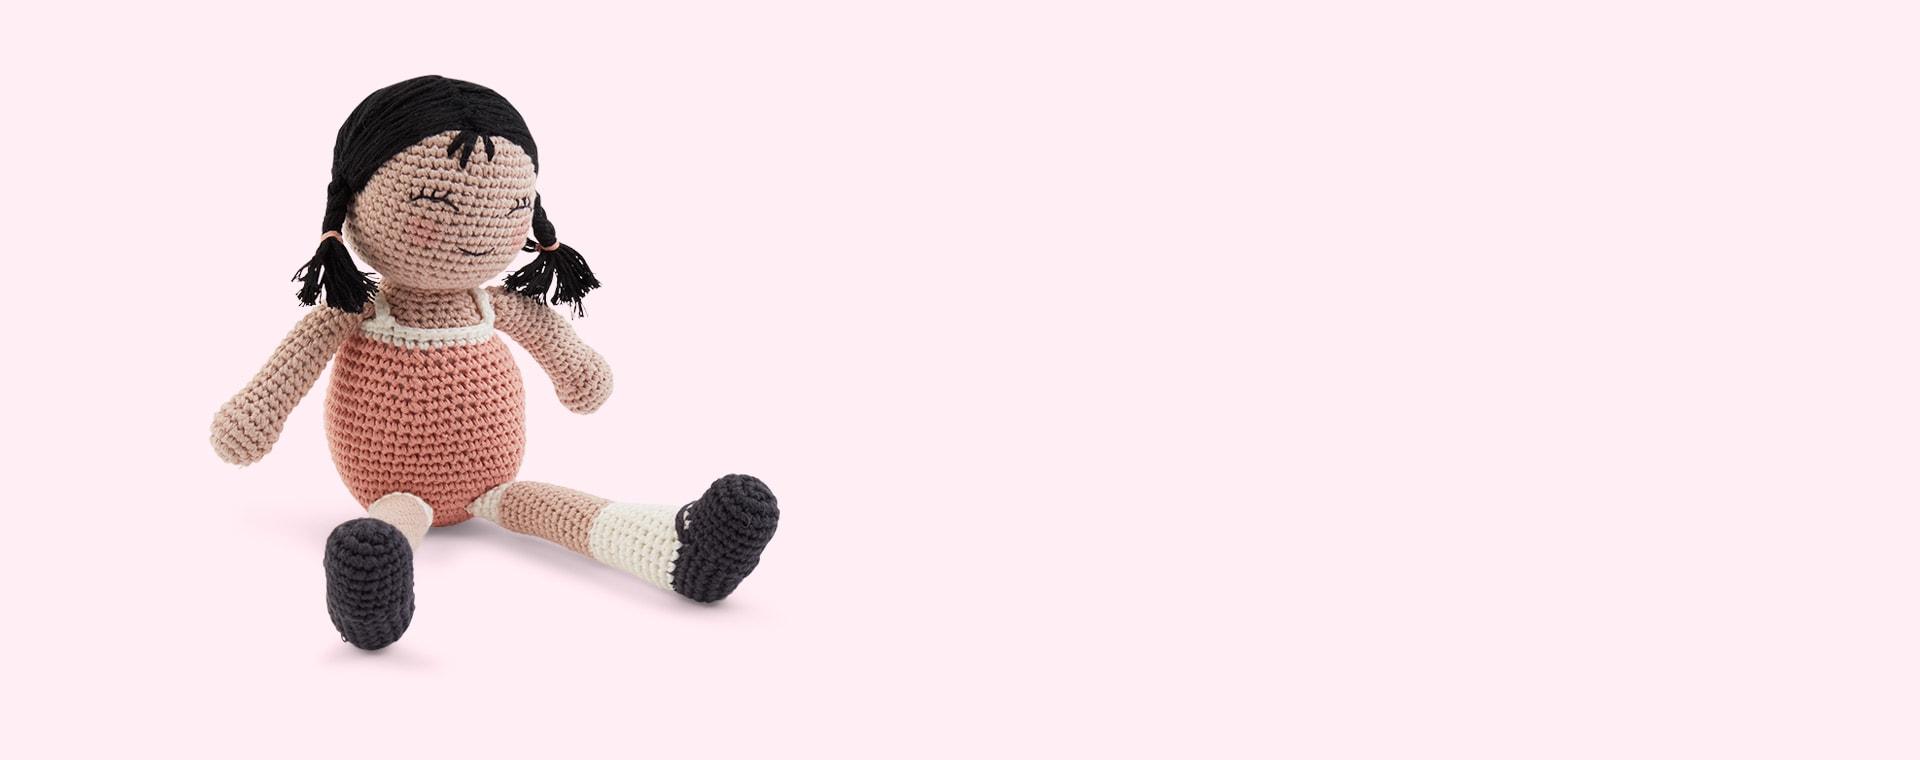 Li Sebra Crochet Doll